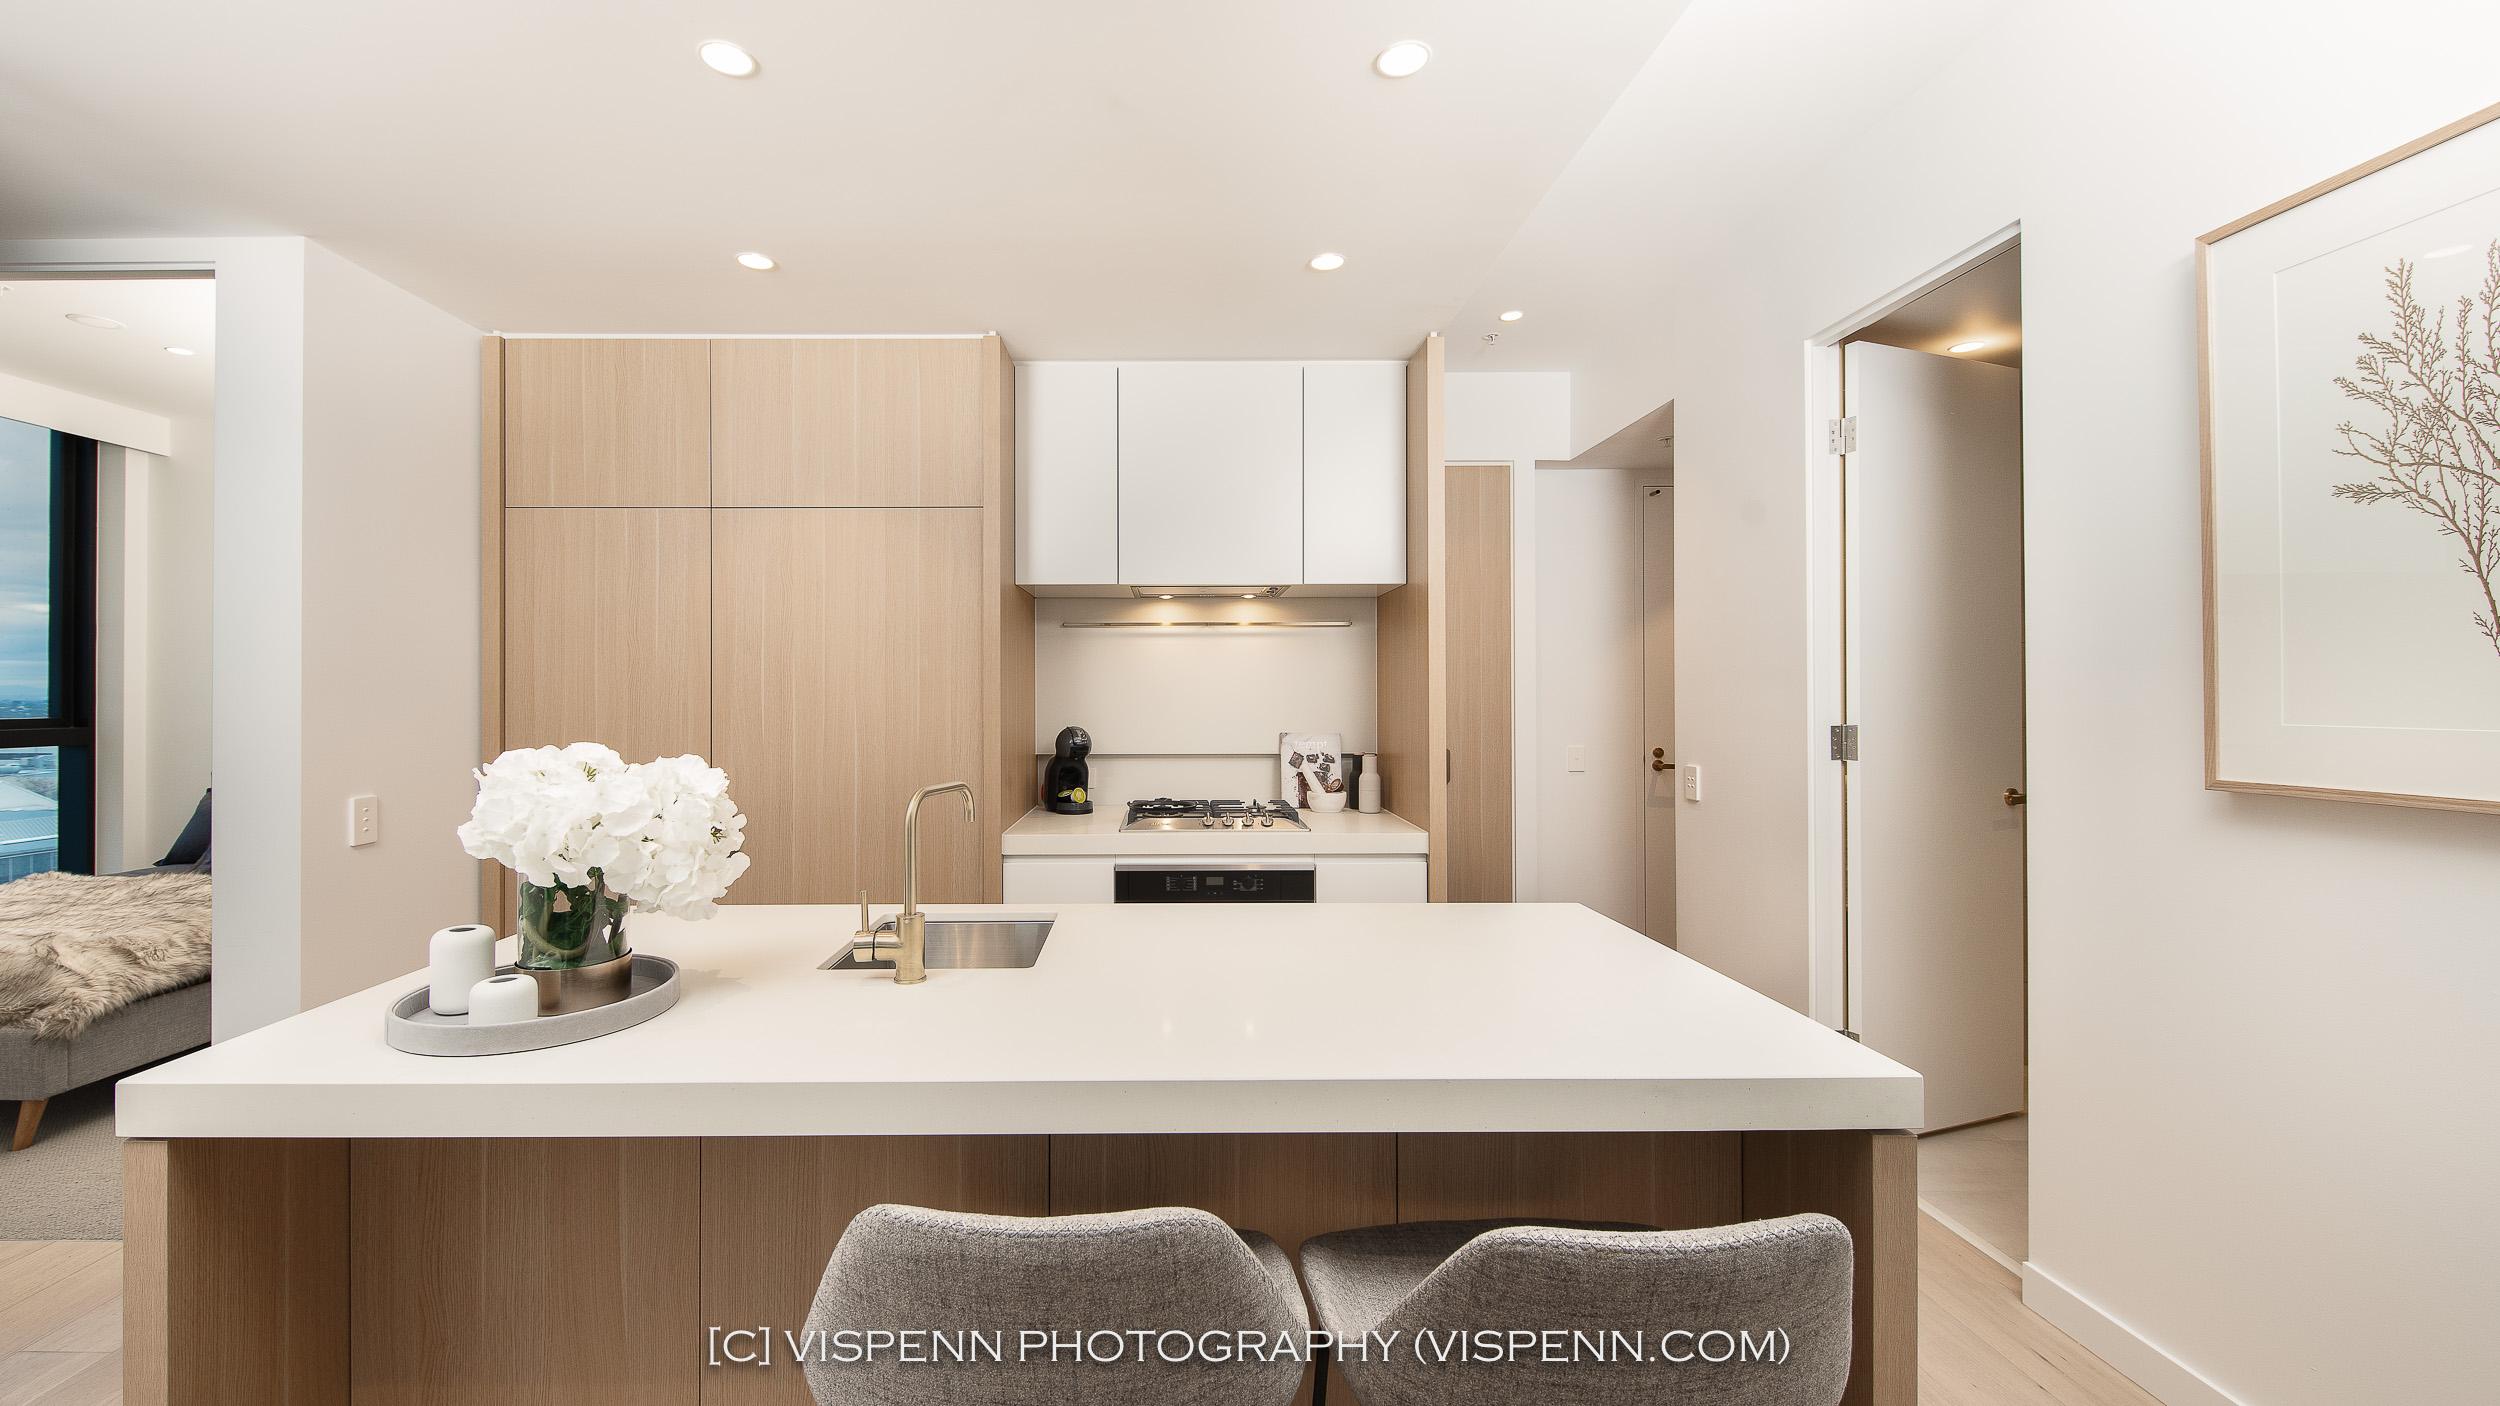 REAL ESTATE INTERIOR Photography Melbourne VISPENN 墨尔本 地产摄影 公寓拍摄 豪宅拍摄 VR远程看房 房产航拍 DSC09602 Edit